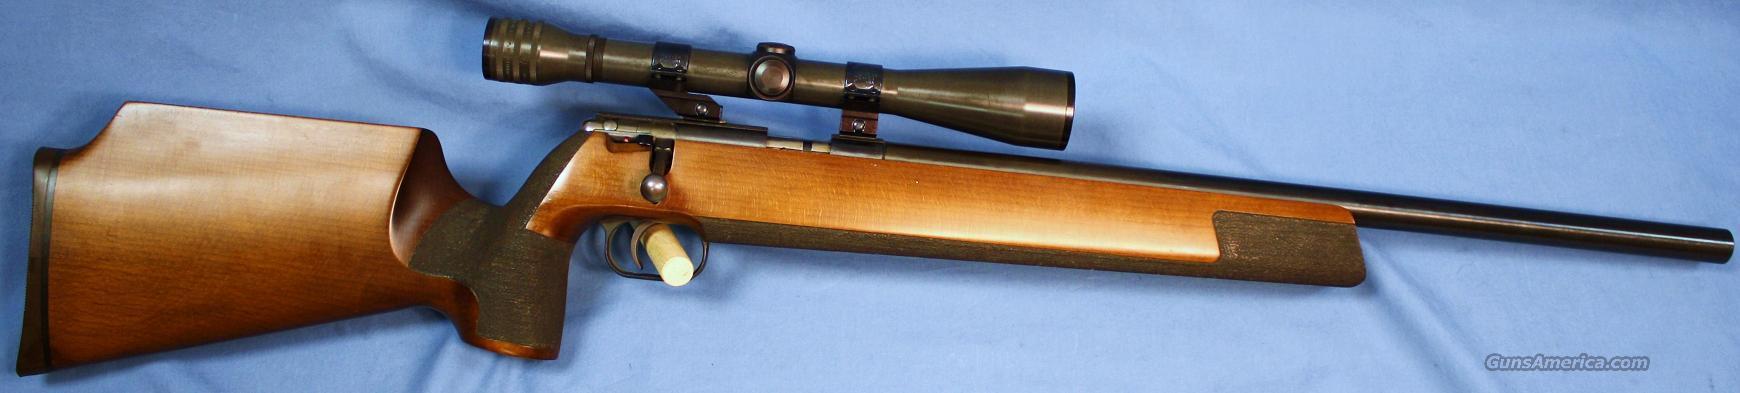 Anschutz Model 64 Silhouette Single Shot Bolt A For Sale